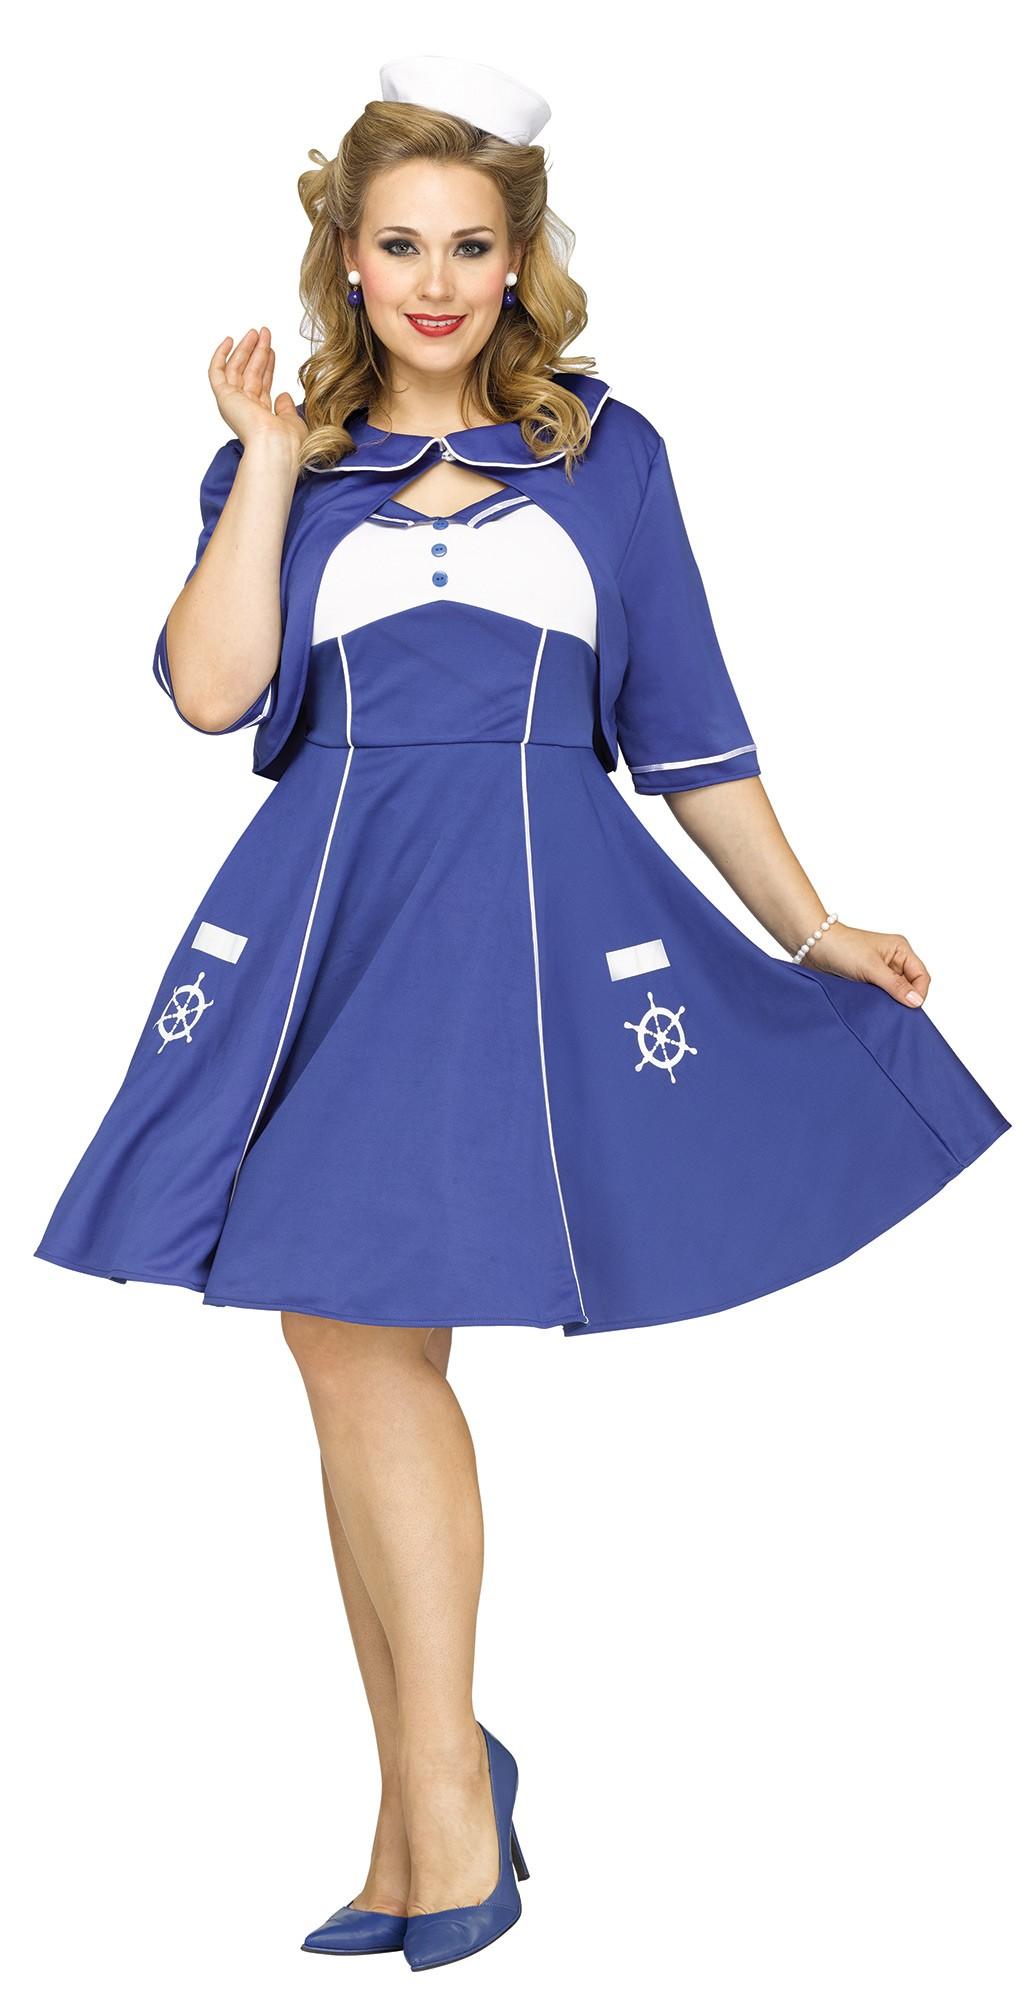 Sweet Sailin\' Sailor Dress Plus Size Women\'s Costume 40s-50s Retro ...